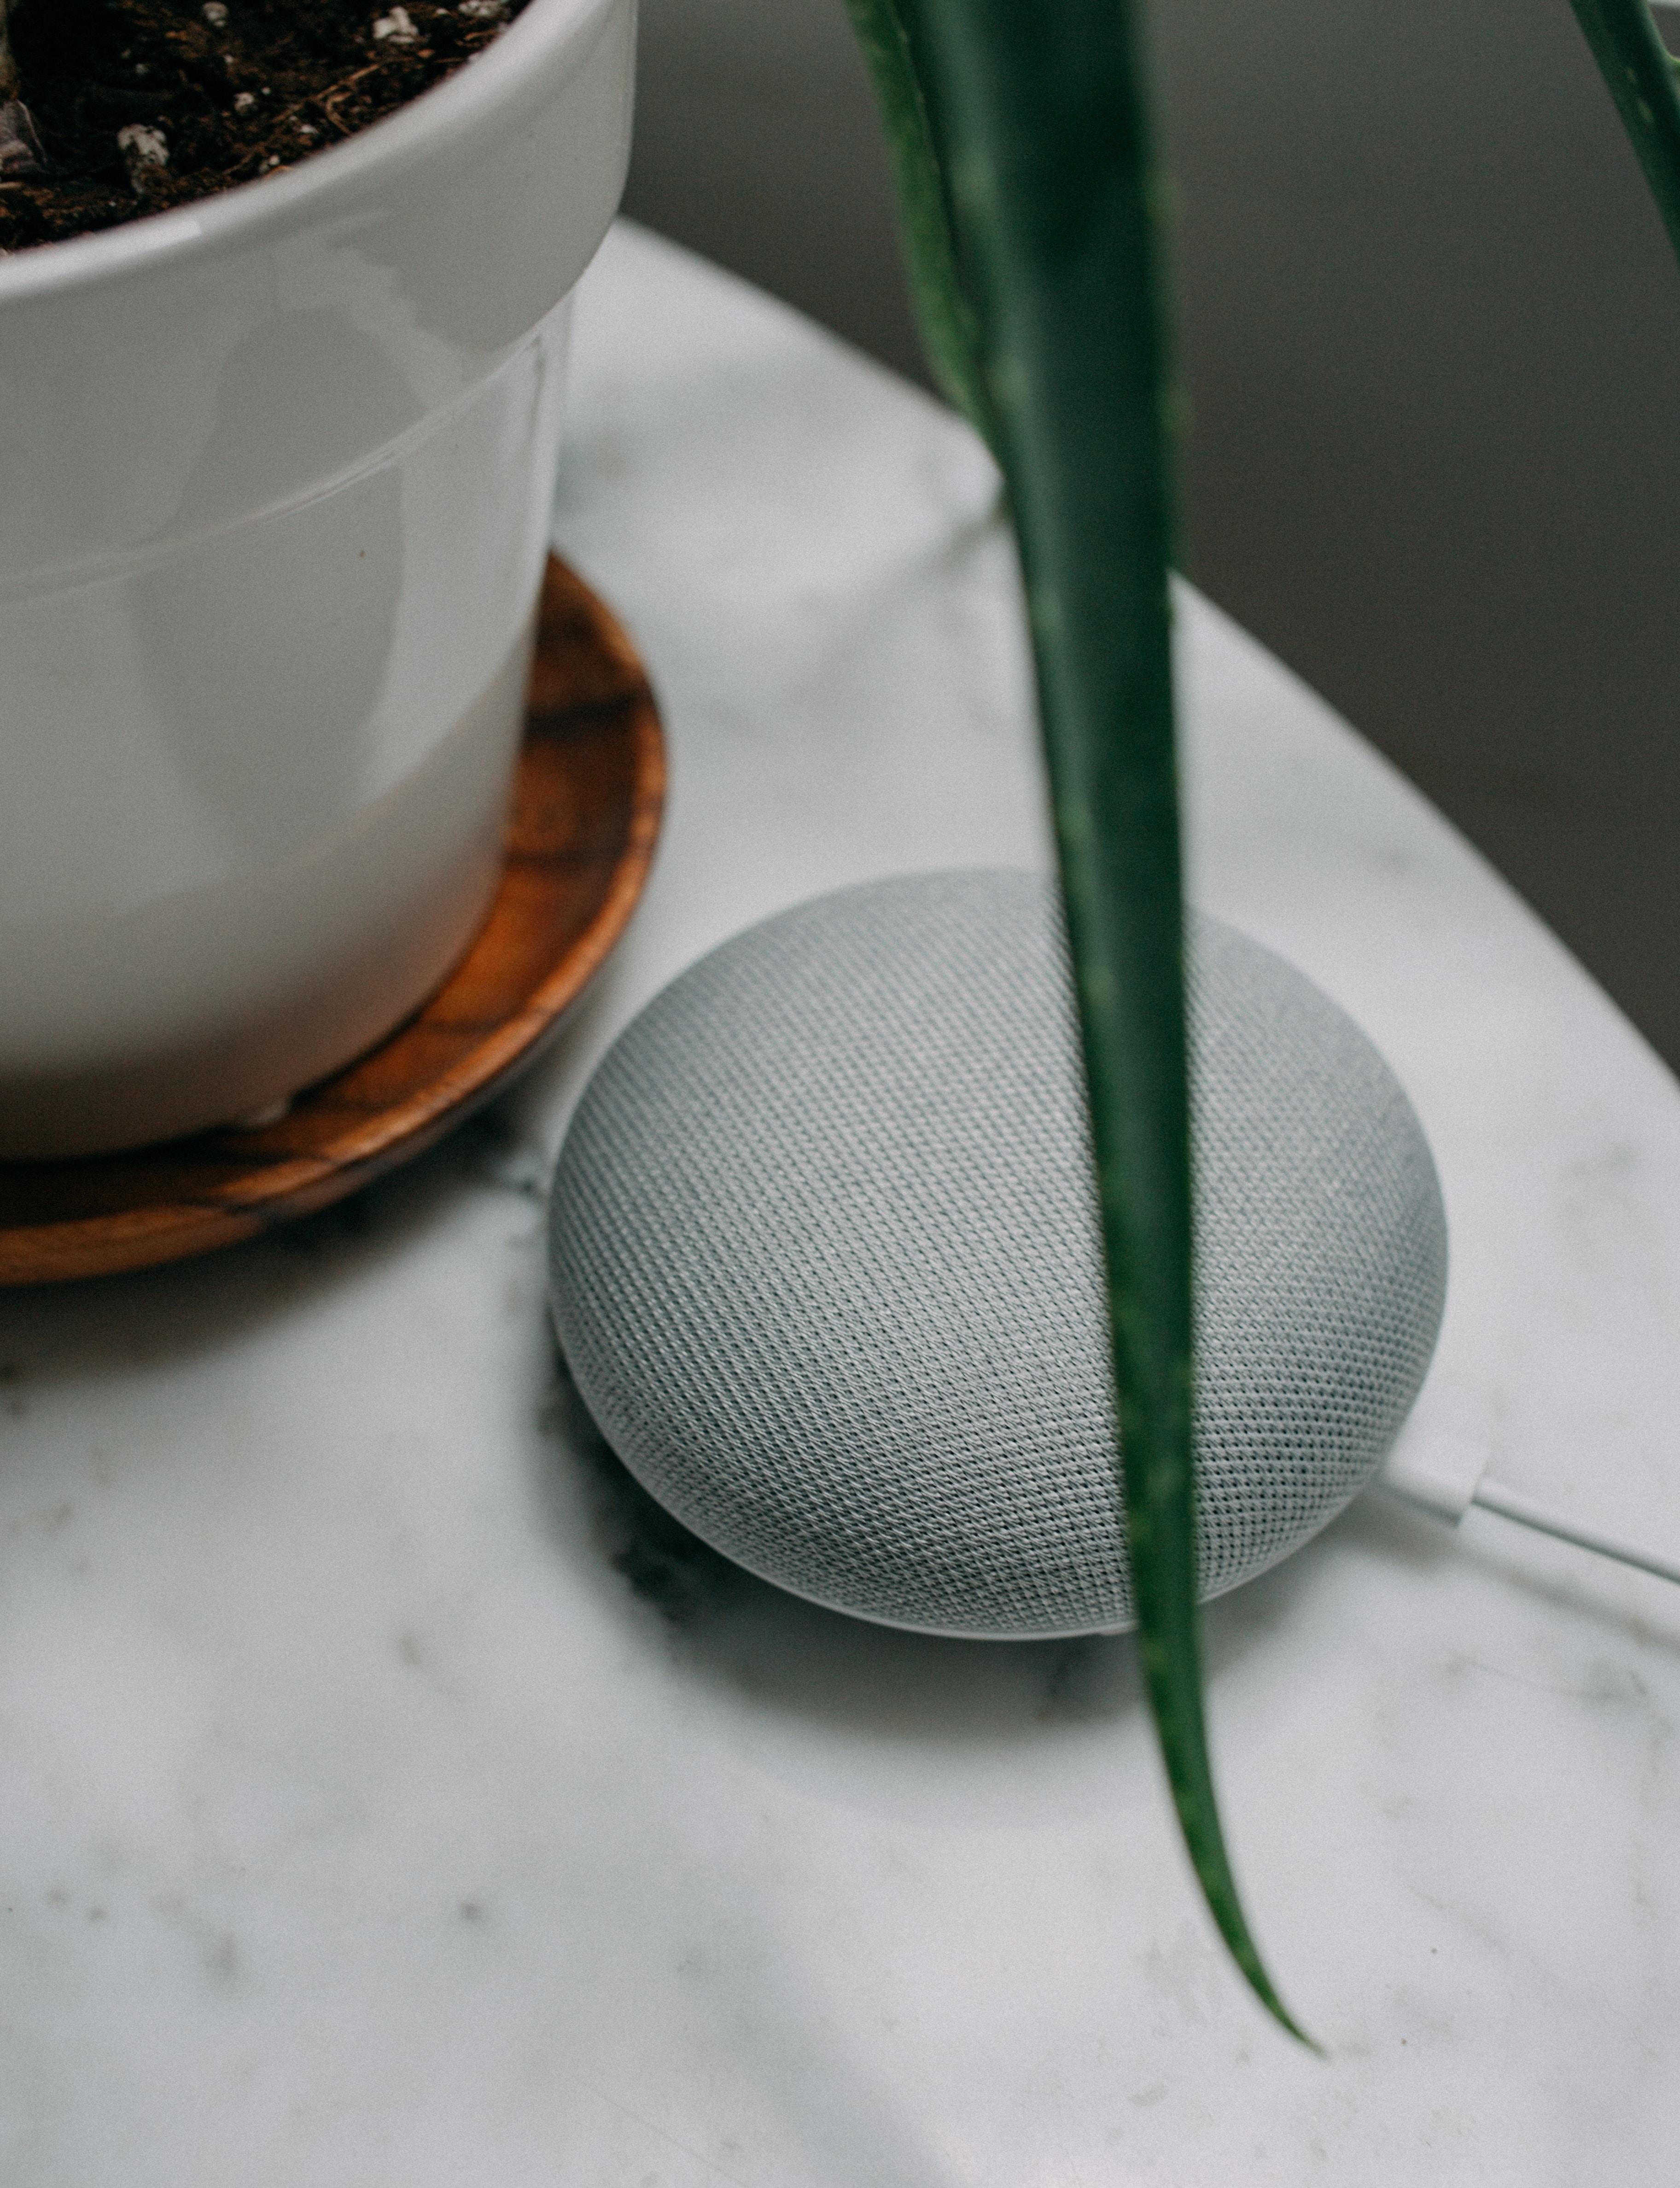 chalk Google Home Mini speaker near plant pot on white surface